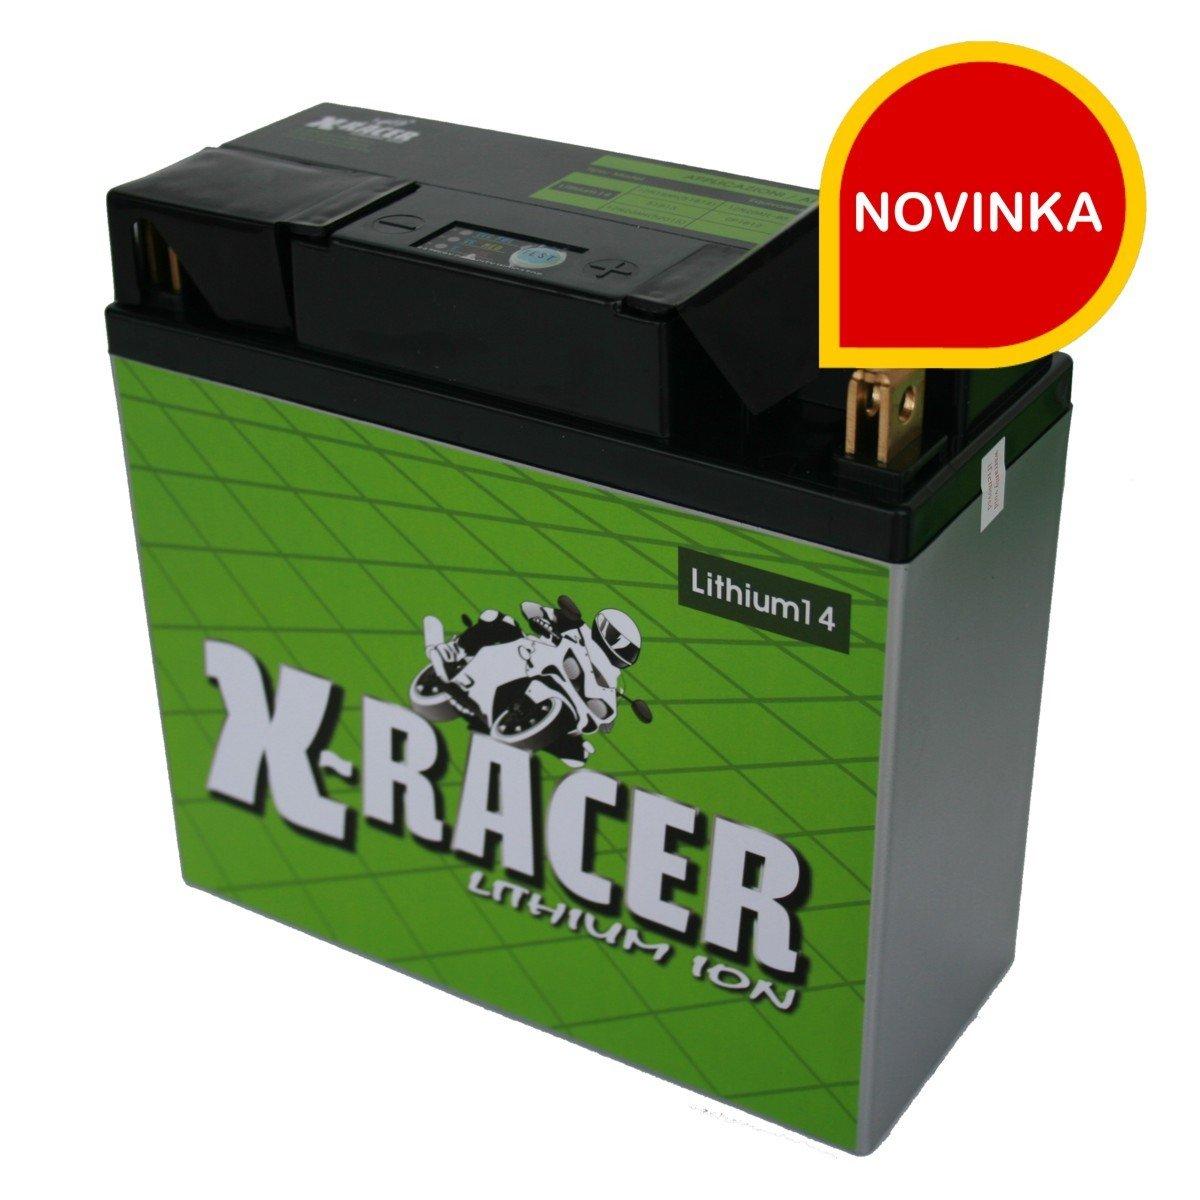 X-RACER Lithium14